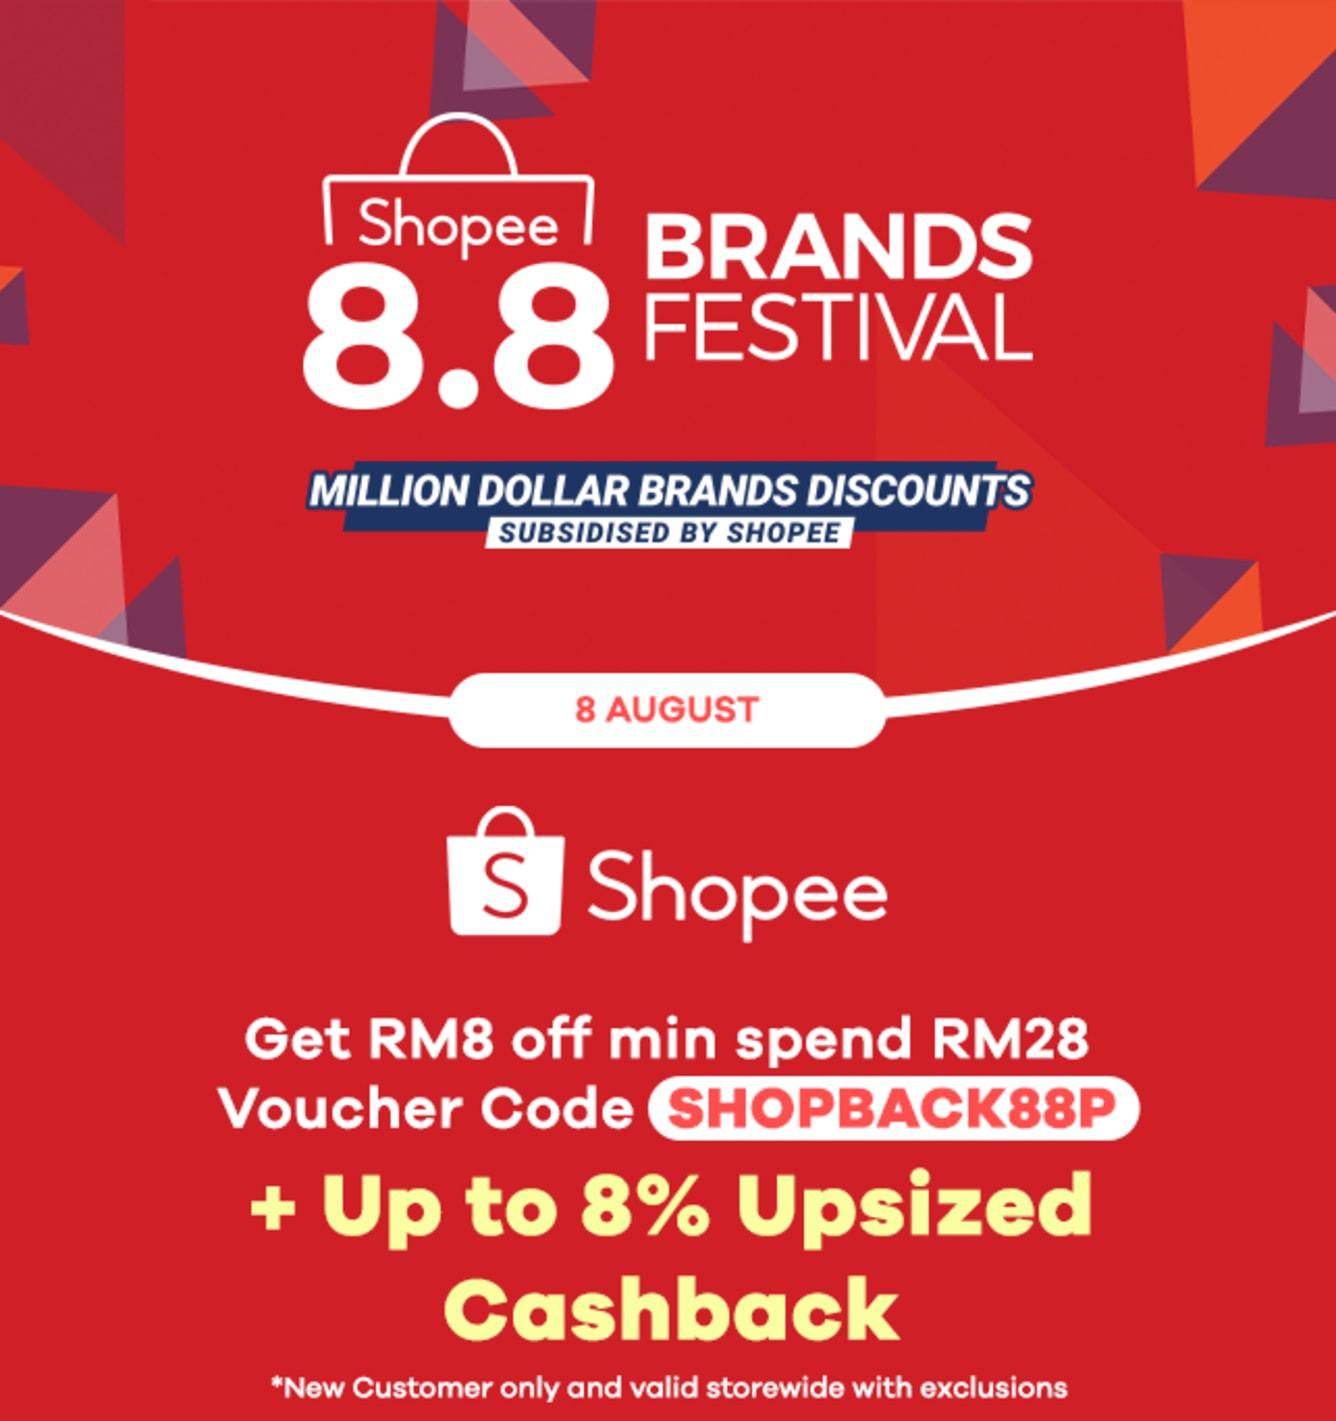 Shopee 3.3 Mega Sale Up to 6% Cashback